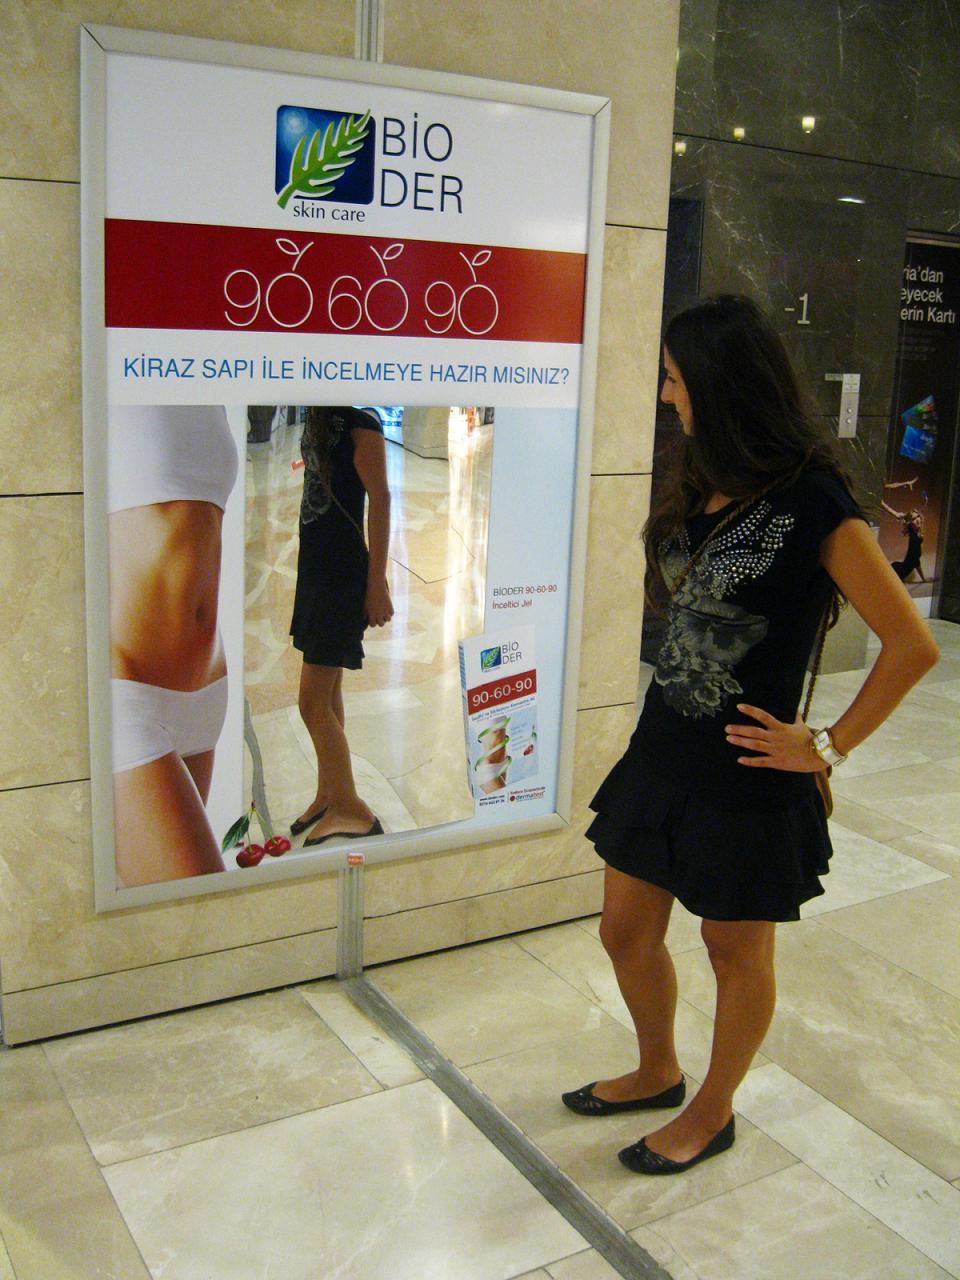 14 Creative Mirror Inspired Advertisements Part 3